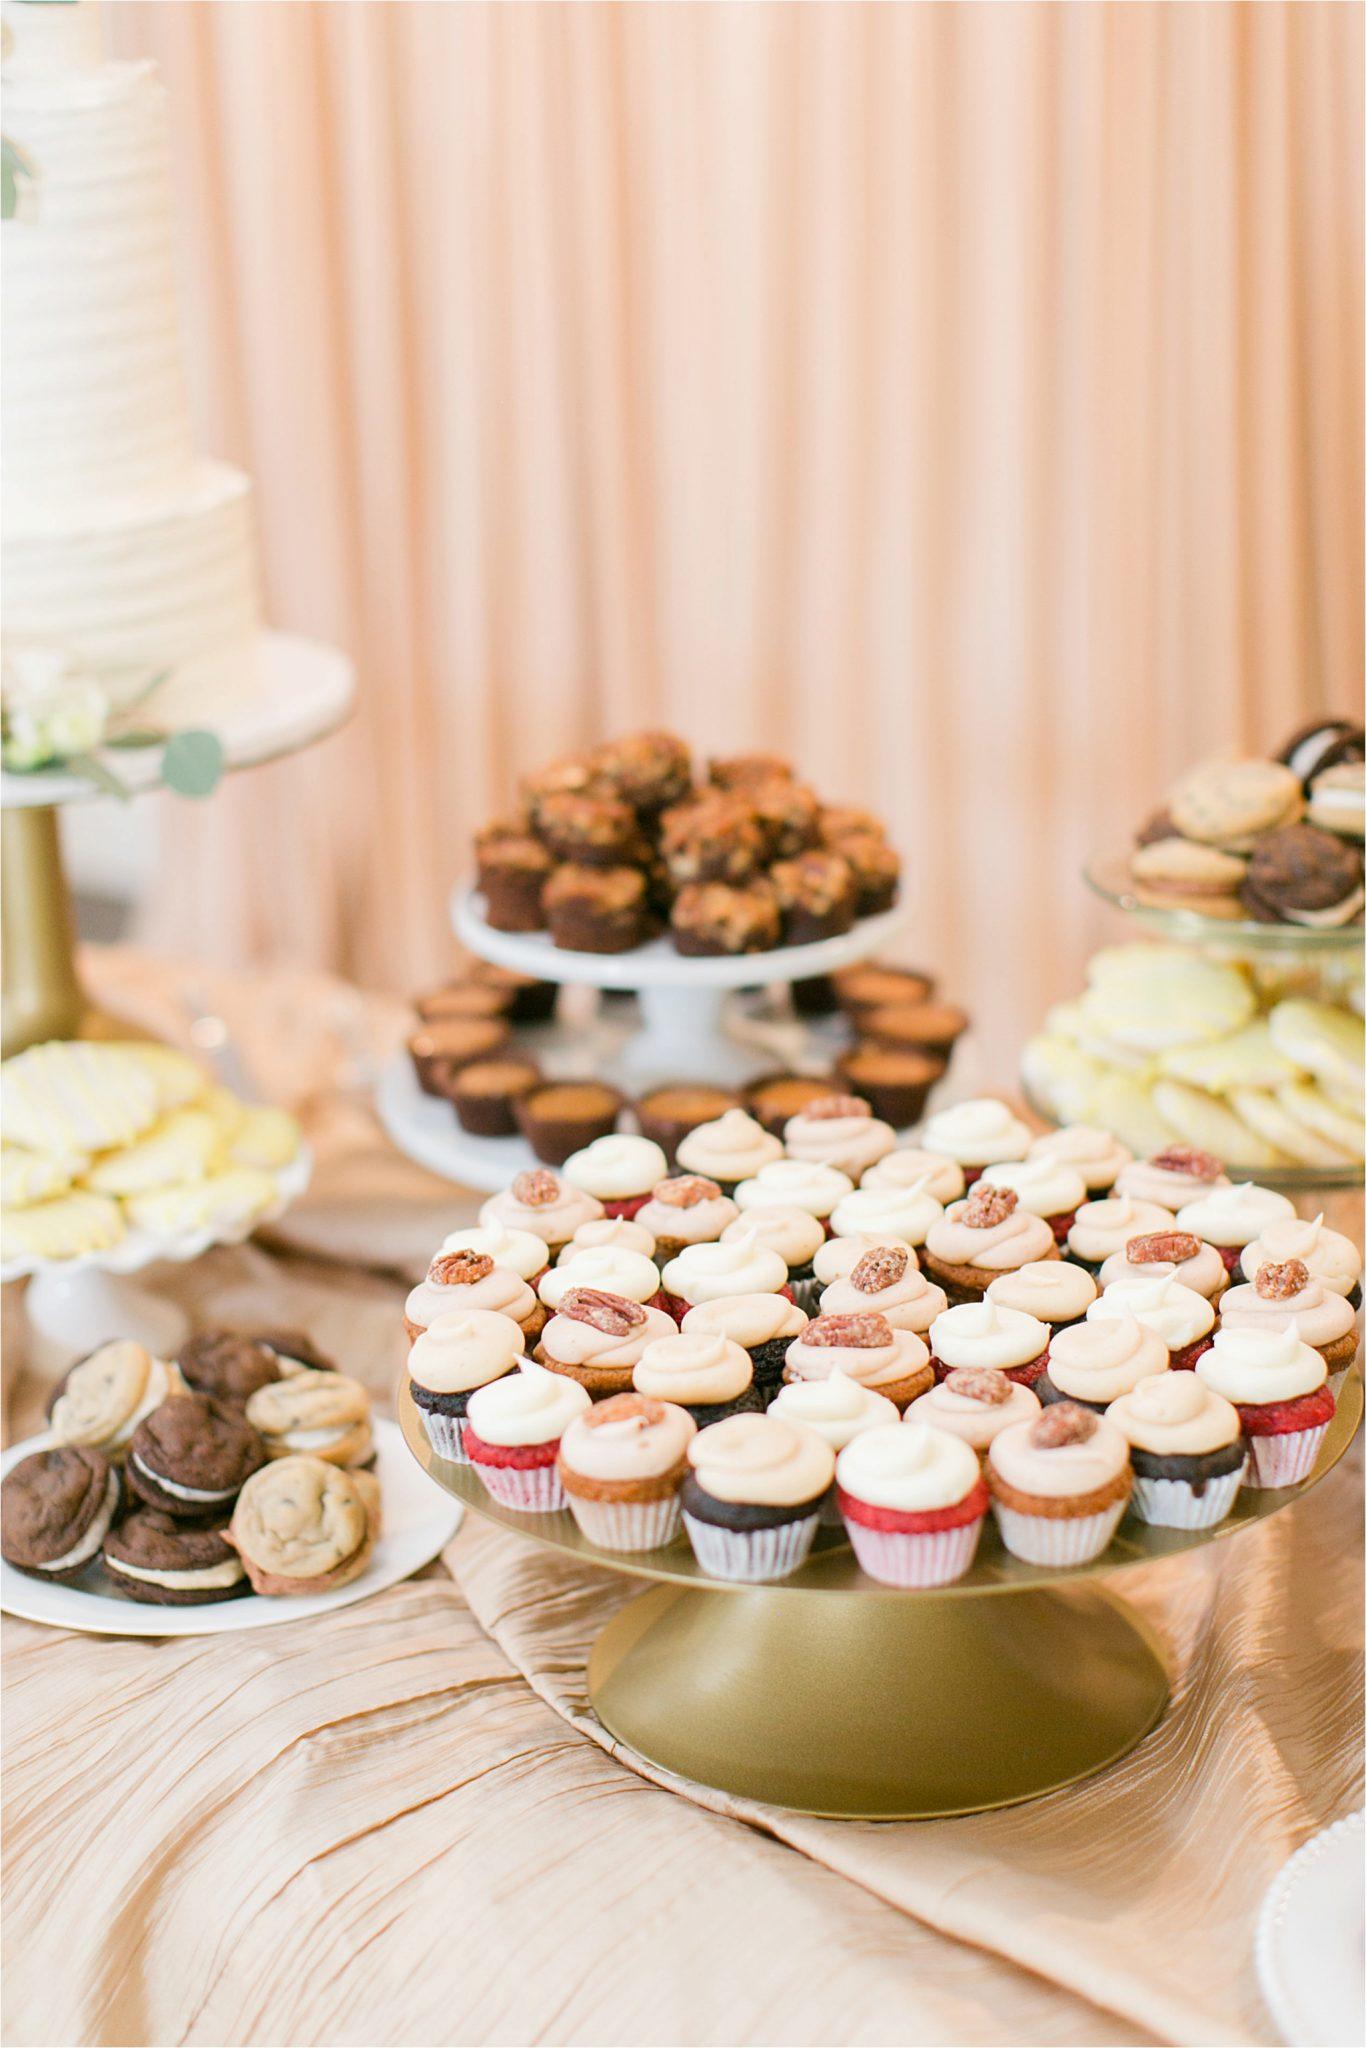 EllenJay Dessert Bar-dessert table-wedding-reception-food ideas